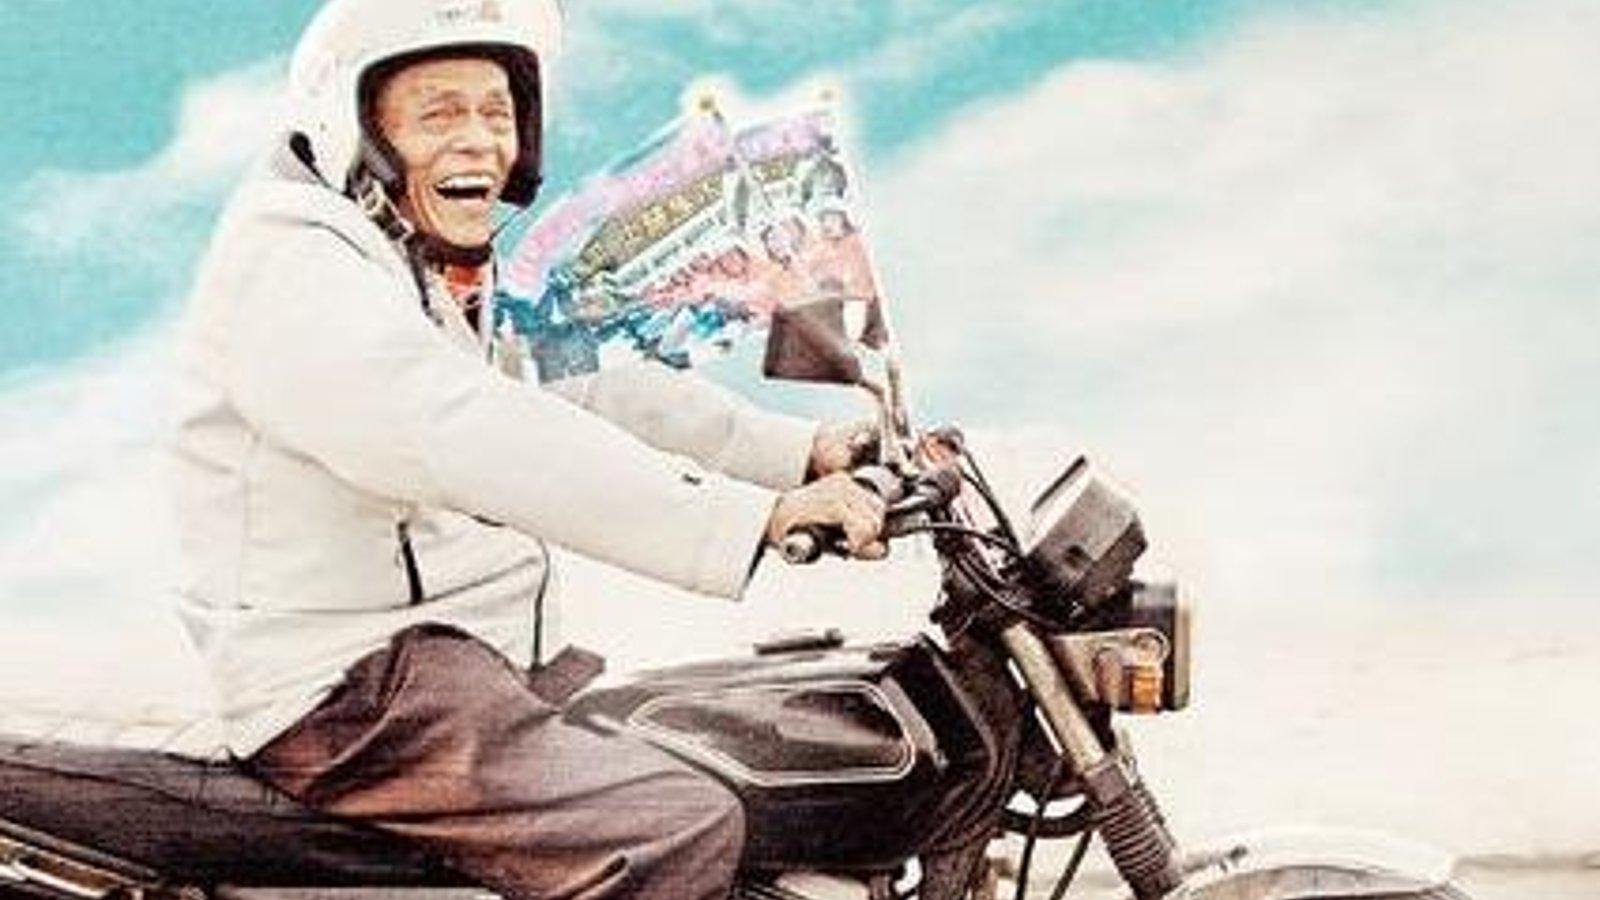 Go Grandriders - A Senior Motorcycle Tour